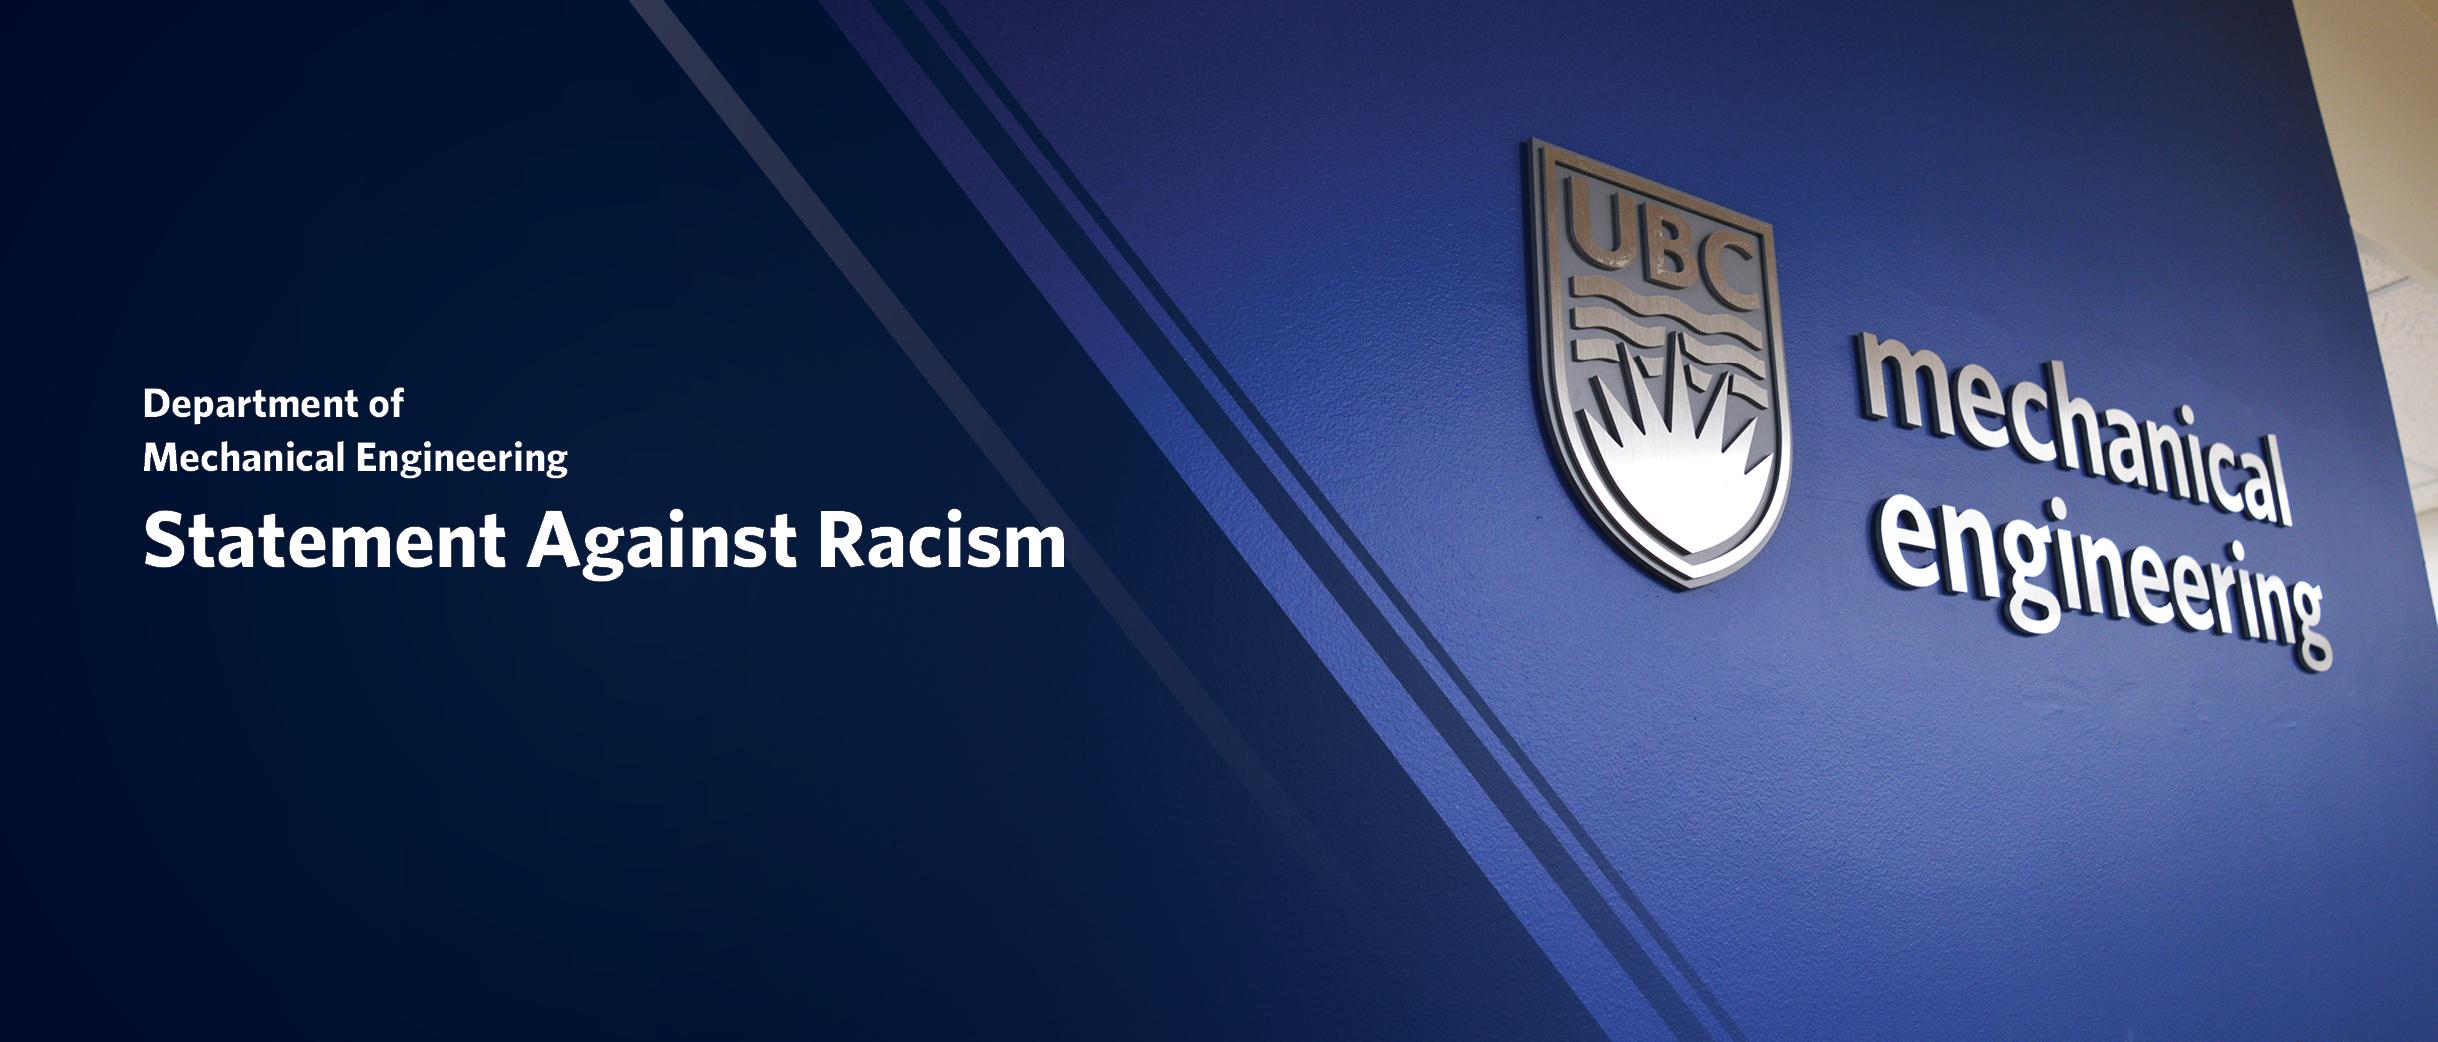 MECH Statement Against Racism